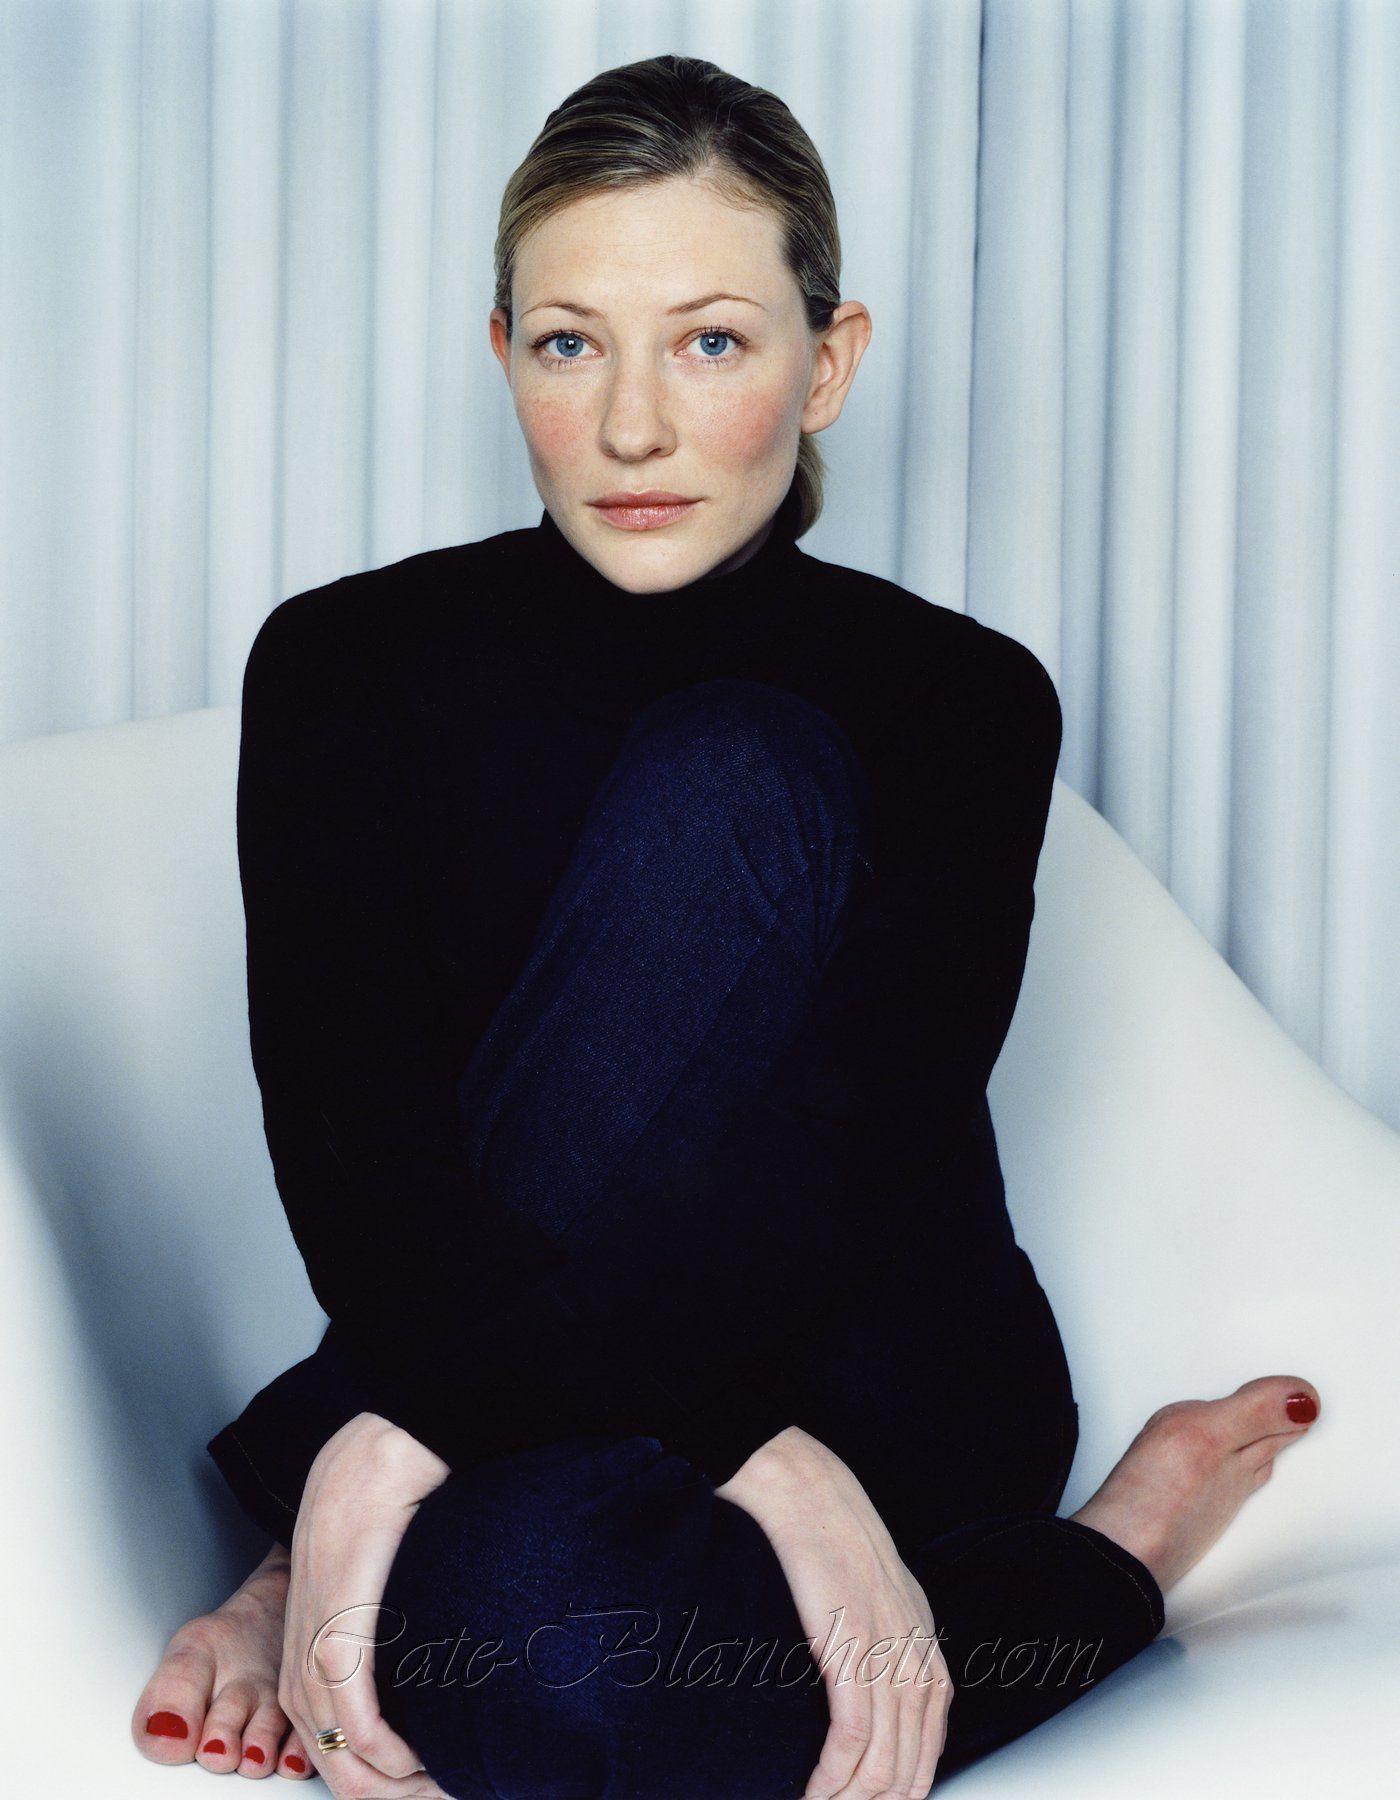 Feet Cate Blanchett nude photos 2019